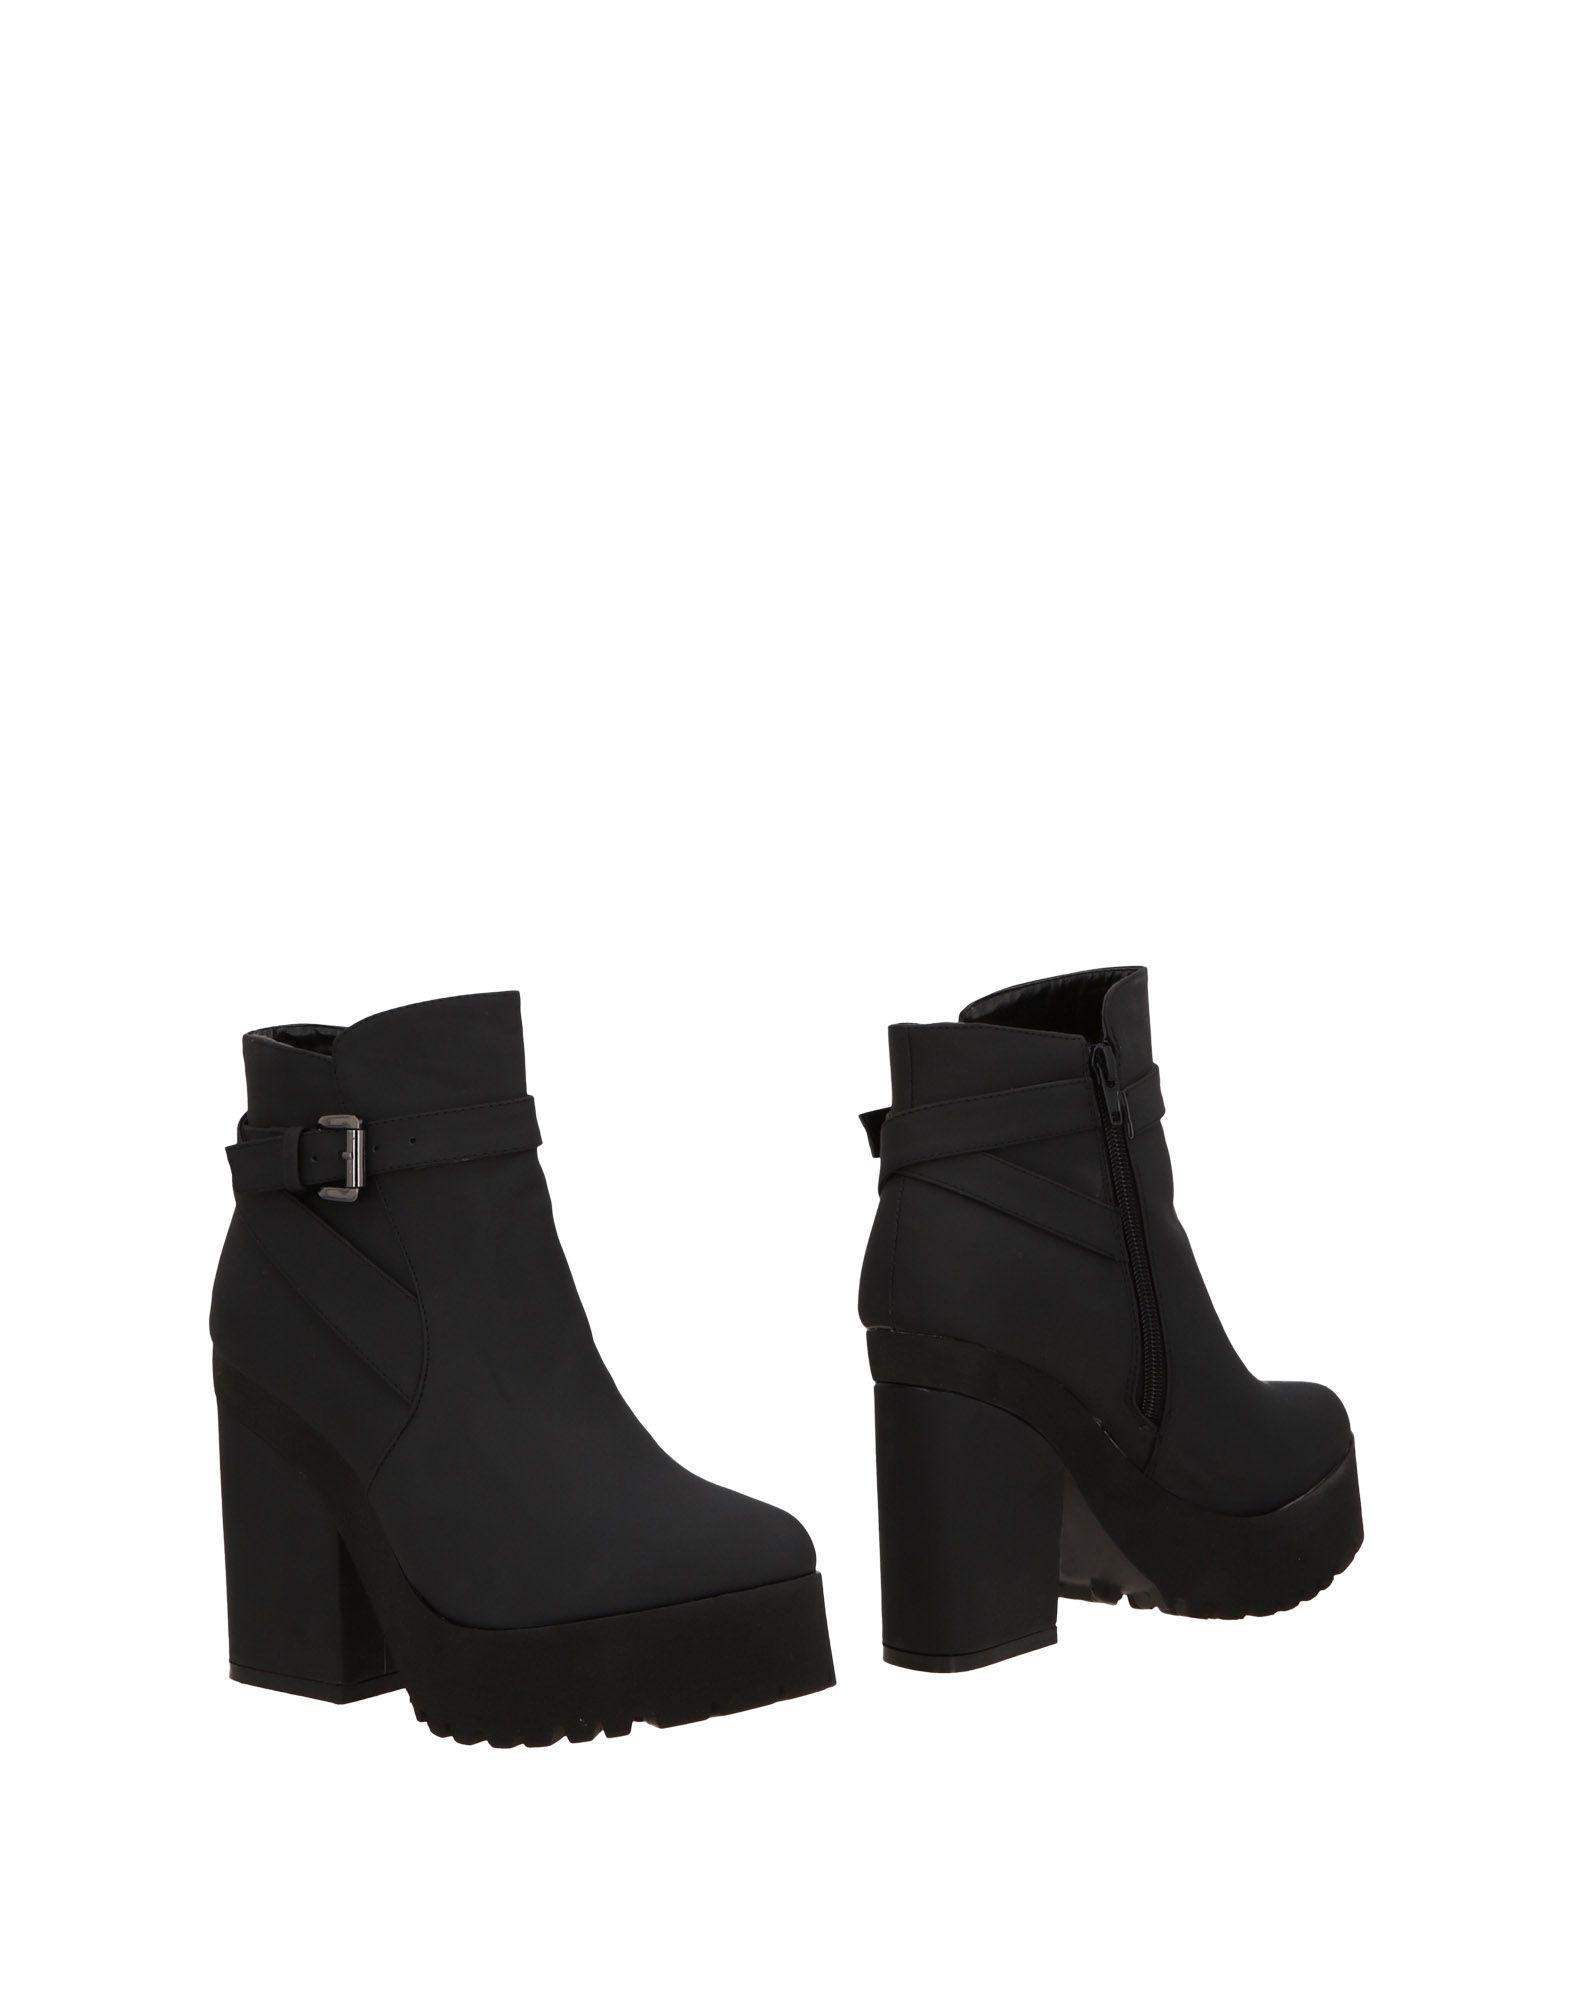 Police 883 Stiefelette Damen beliebte  11475591NO Gute Qualität beliebte Damen Schuhe 3e4fa9